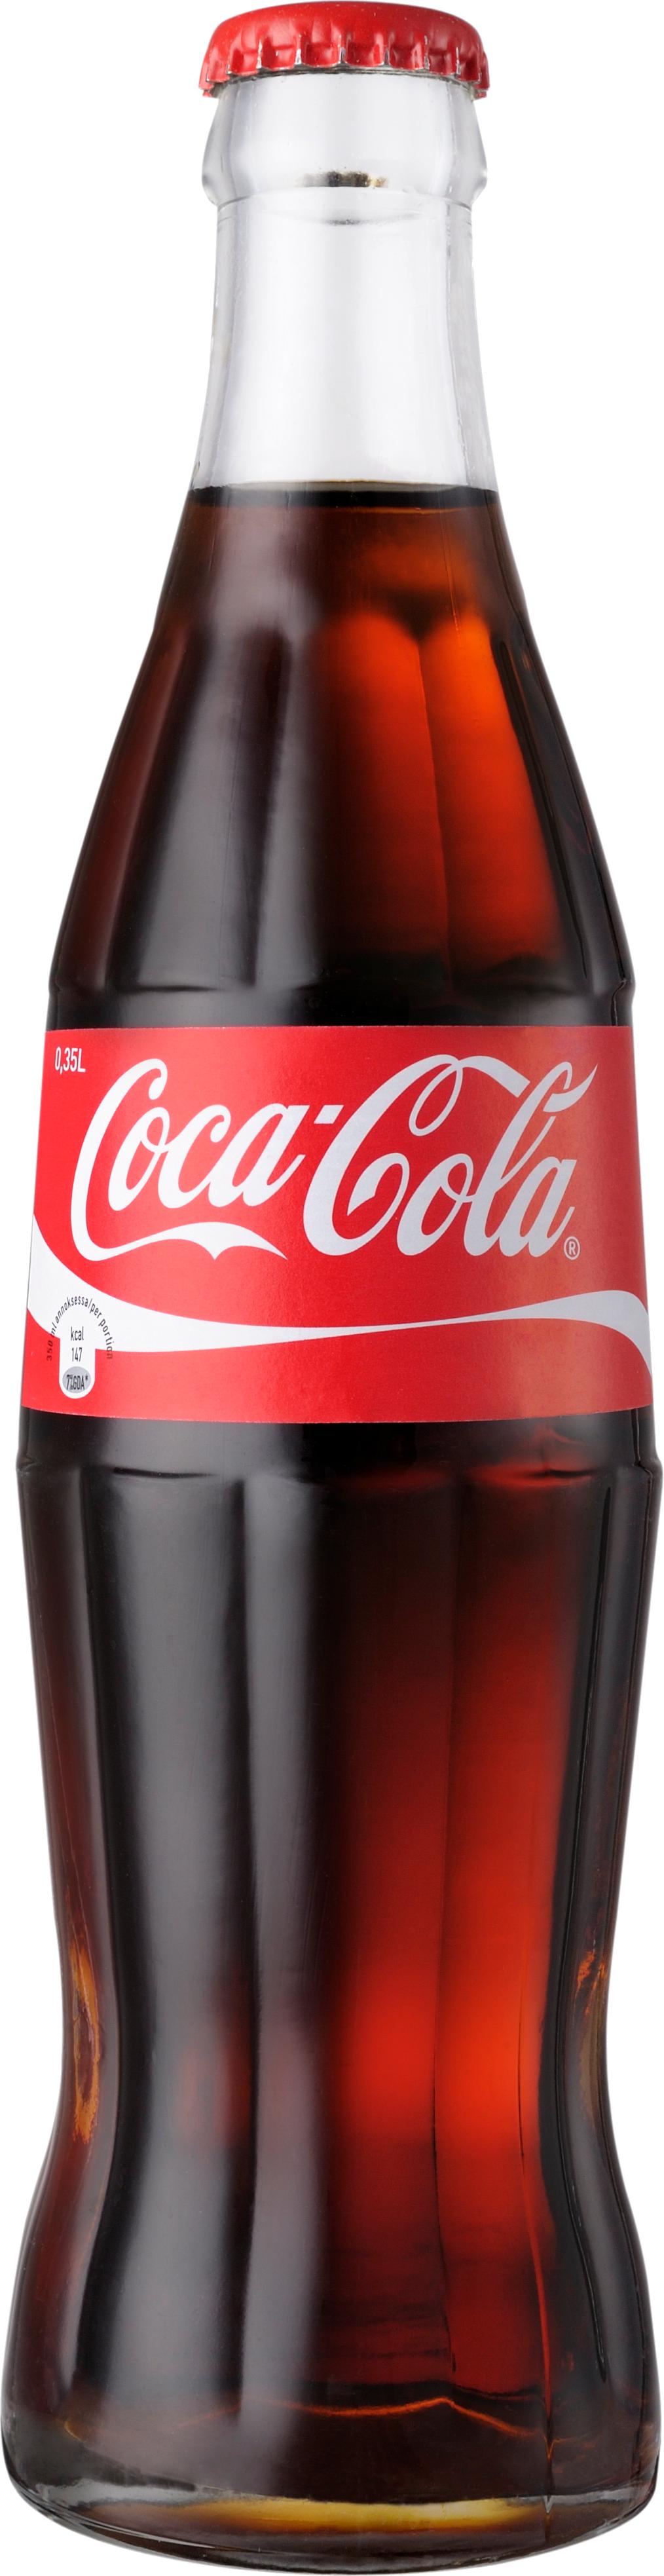 Coca cola bottle png. Images free download image